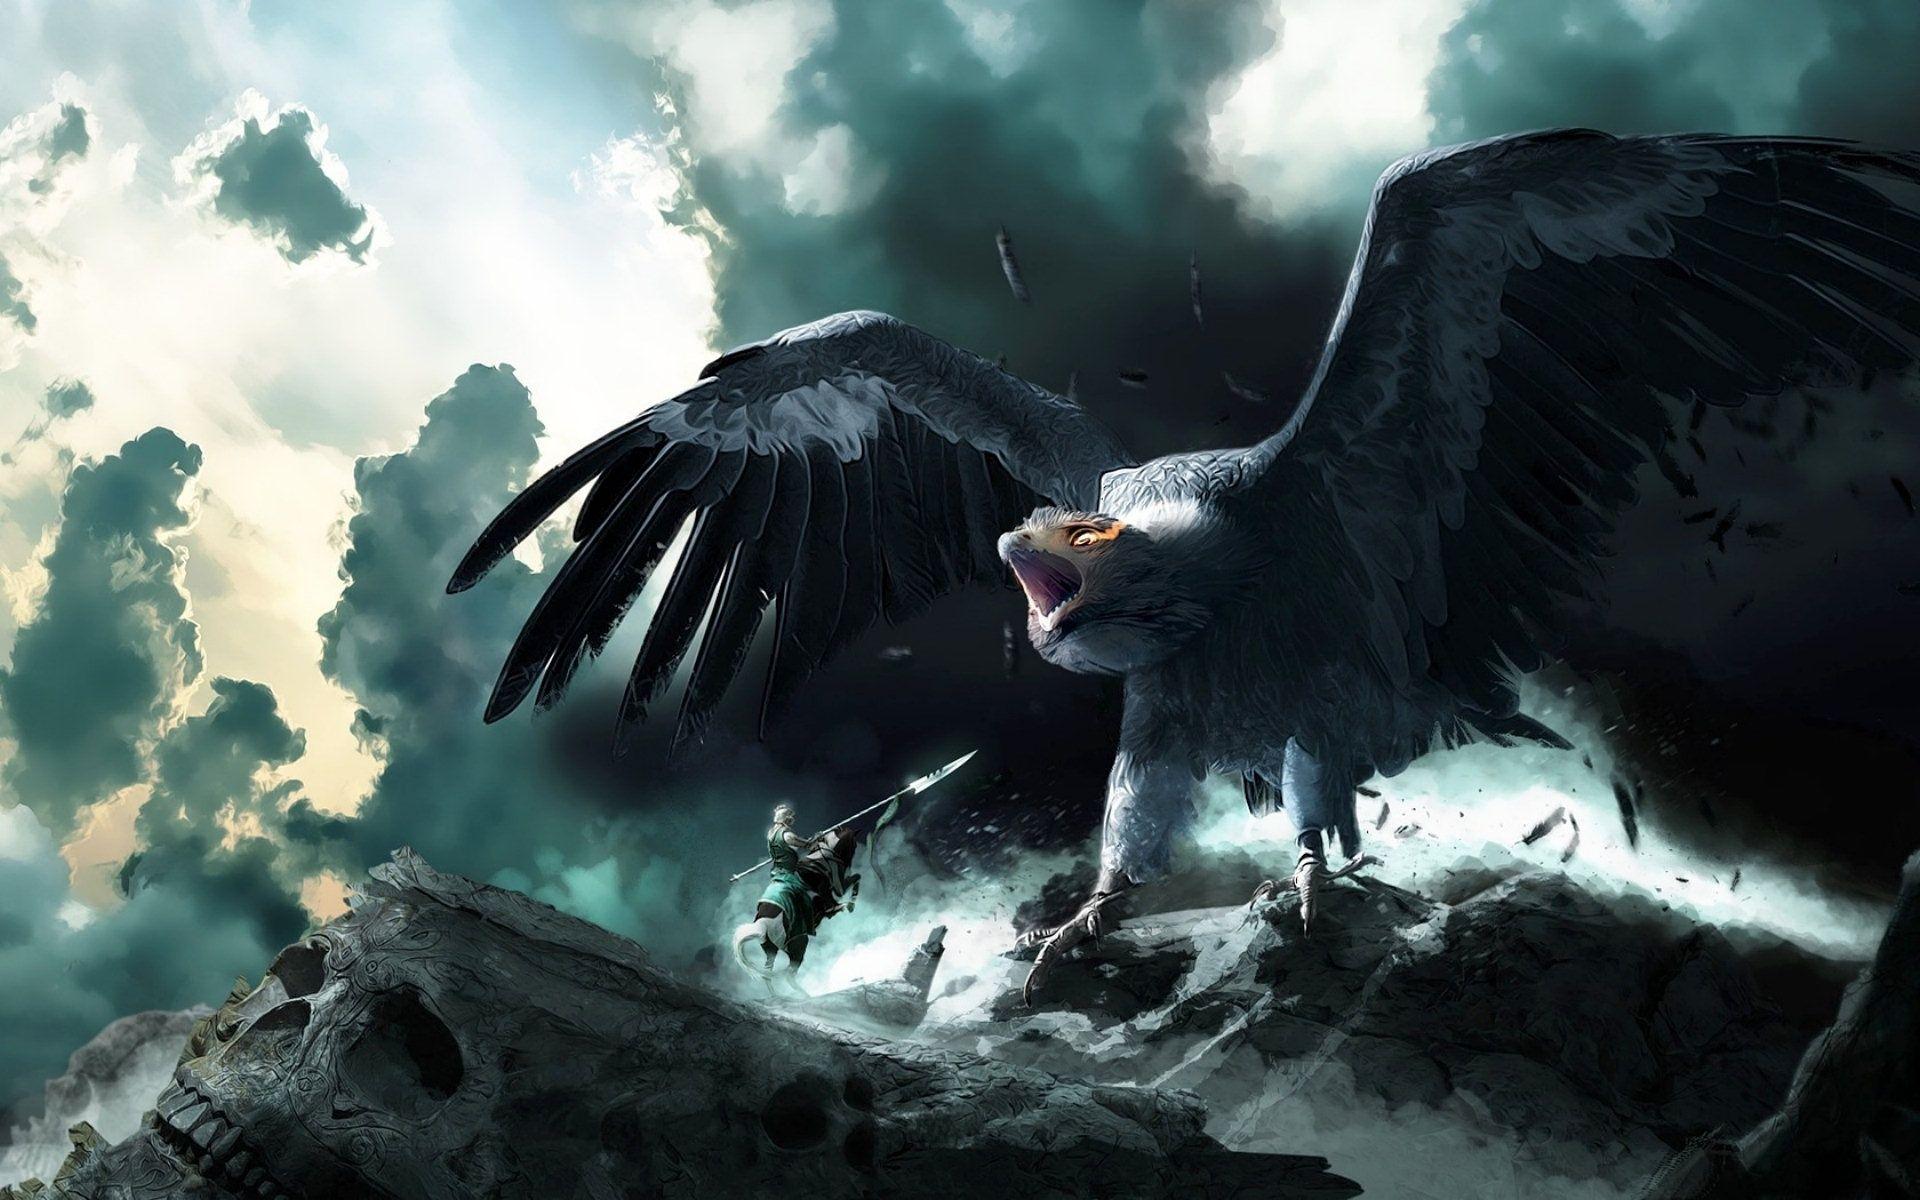 Fantasy Giant Bird Hawk Eagle Fantasy Hd Wallpaper 1920 1200 Followme Cooliphone6case On Twitter Facebook Go Fantasy Concept Art Hd Wallpaper Fantasy Fantasy giants wallpapers fantasy